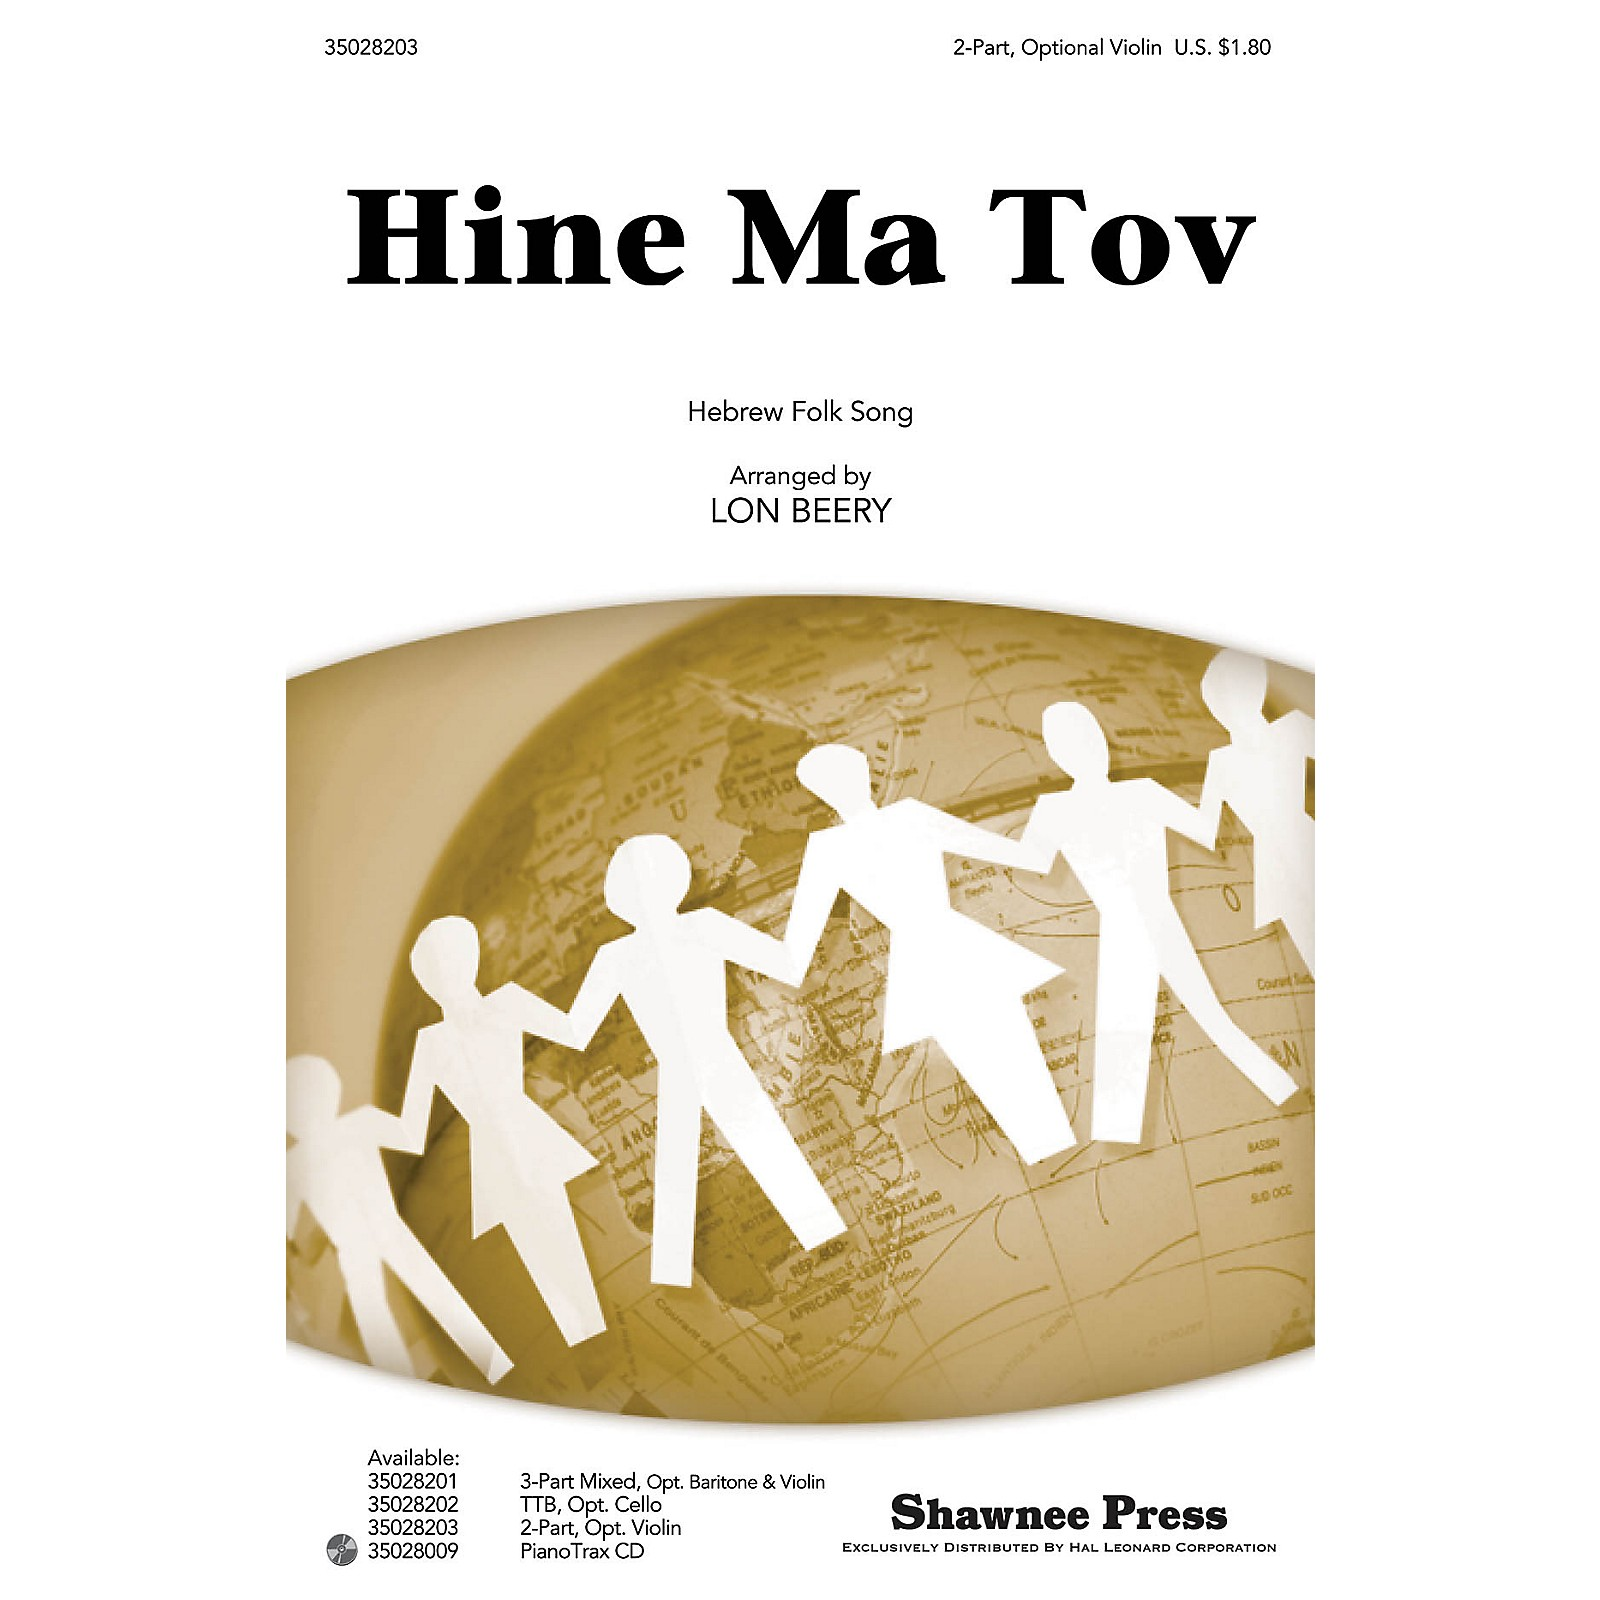 Shawnee Press Hine Ma Tov 2-PART arranged by Lon Beery